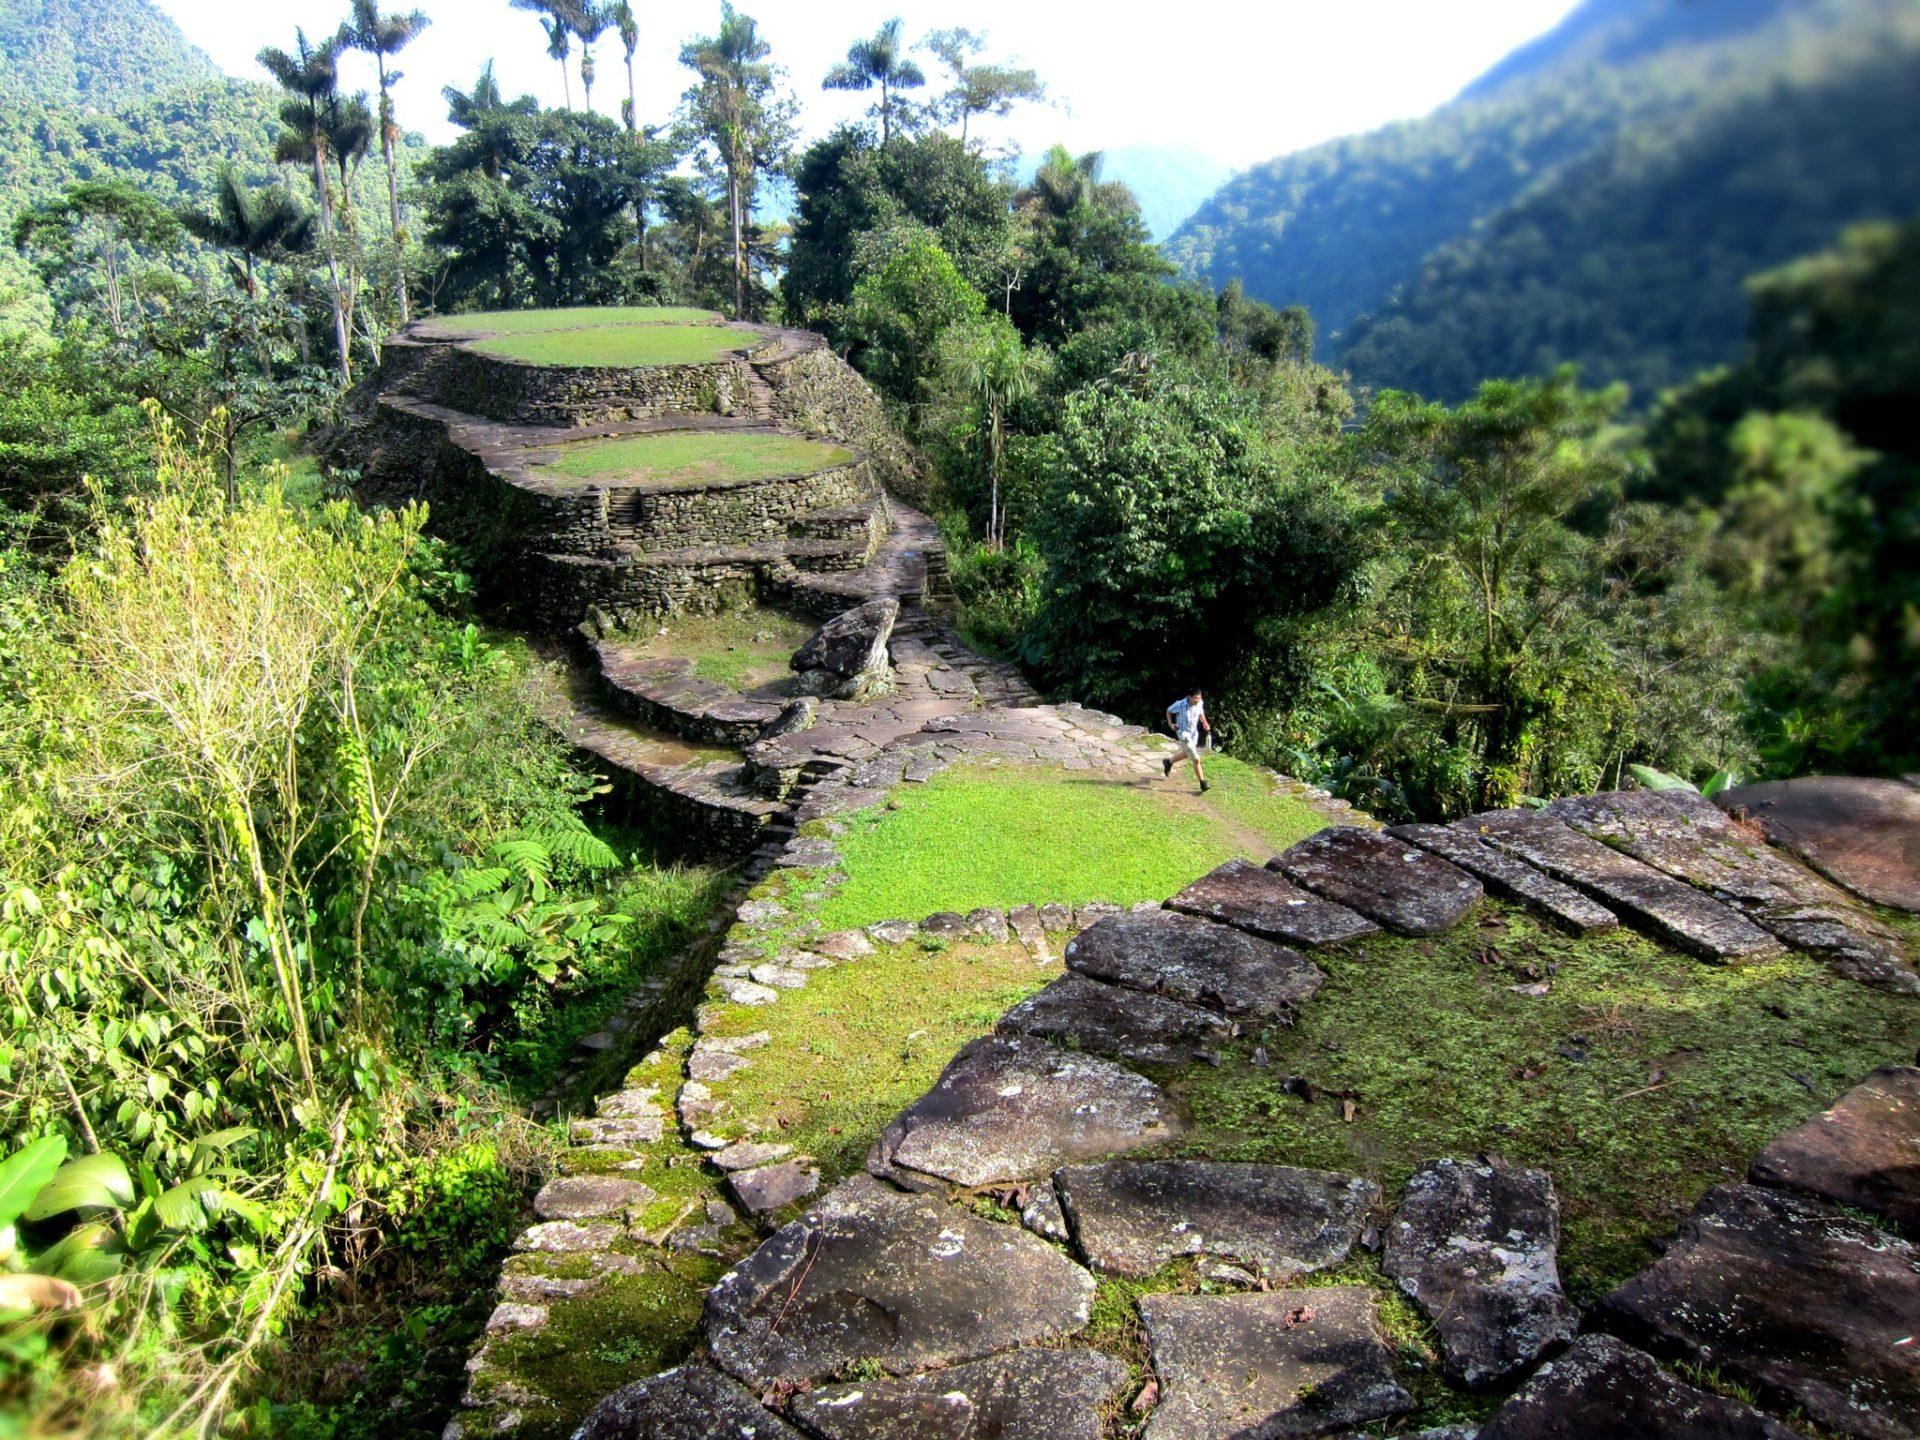 Lost City, Santa Marta Colombia. Photo by Andrew Hyde via Flickr CC